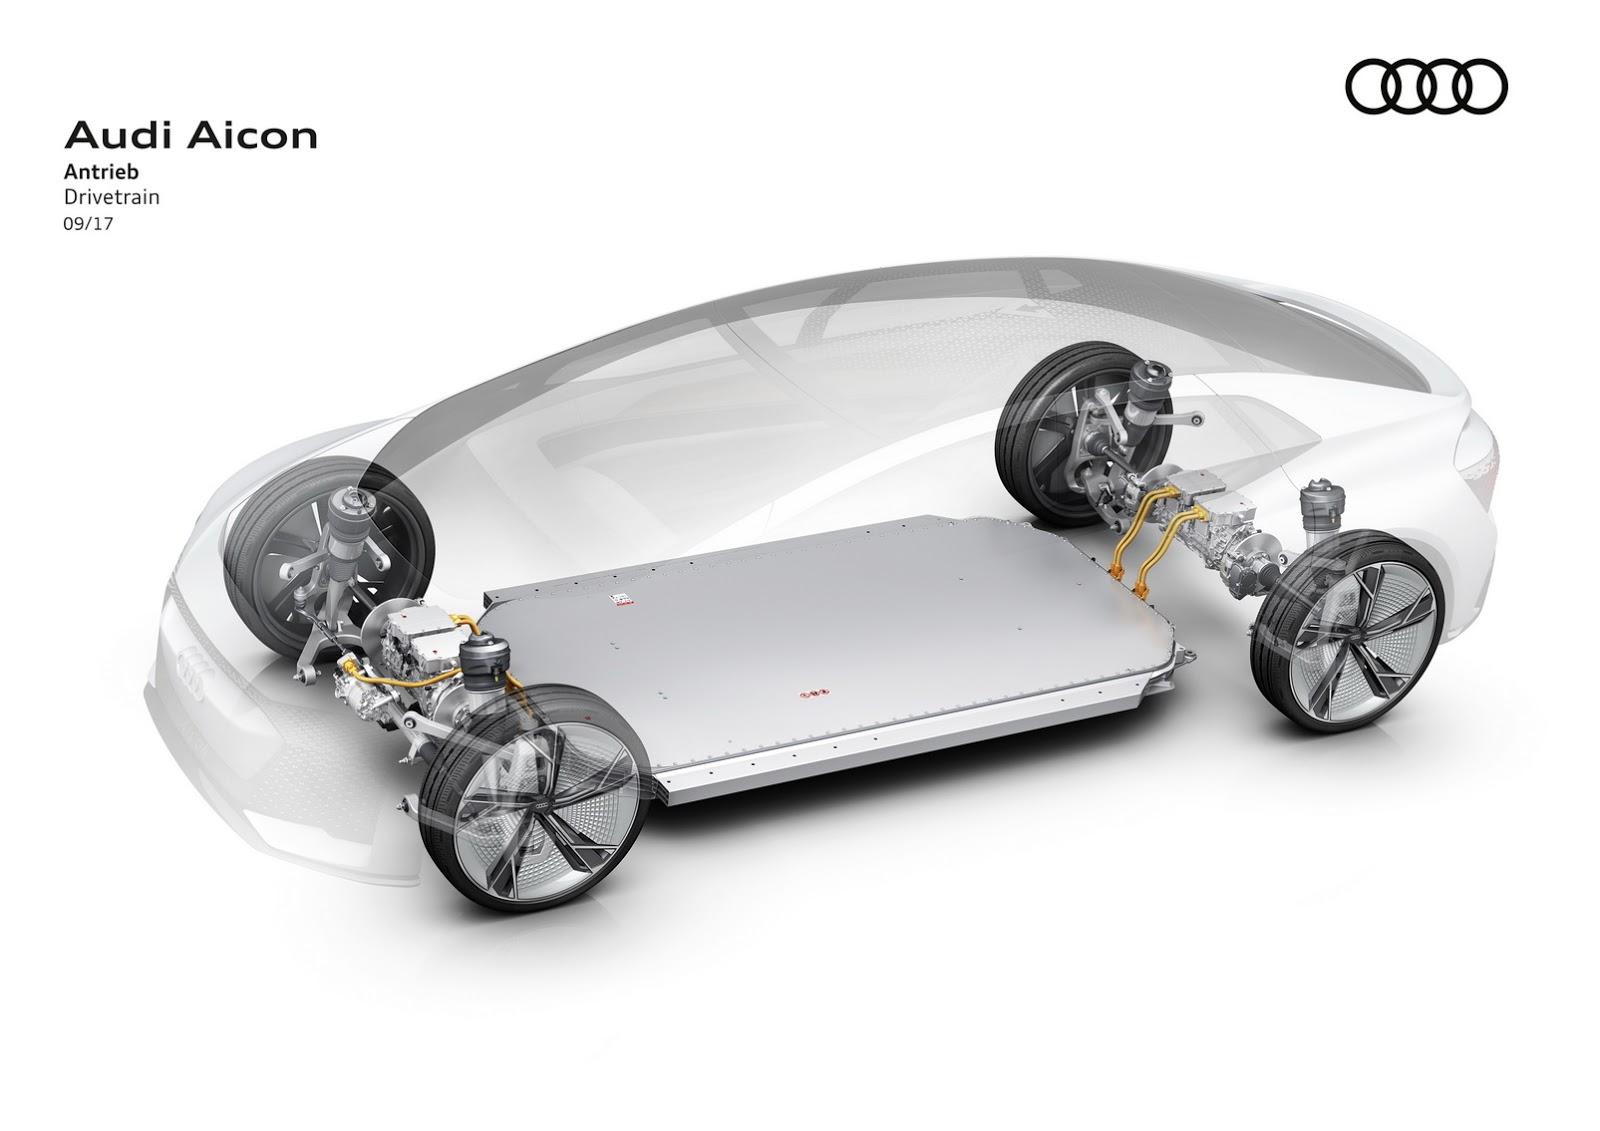 audi-aircon-frankfurt-concept-45